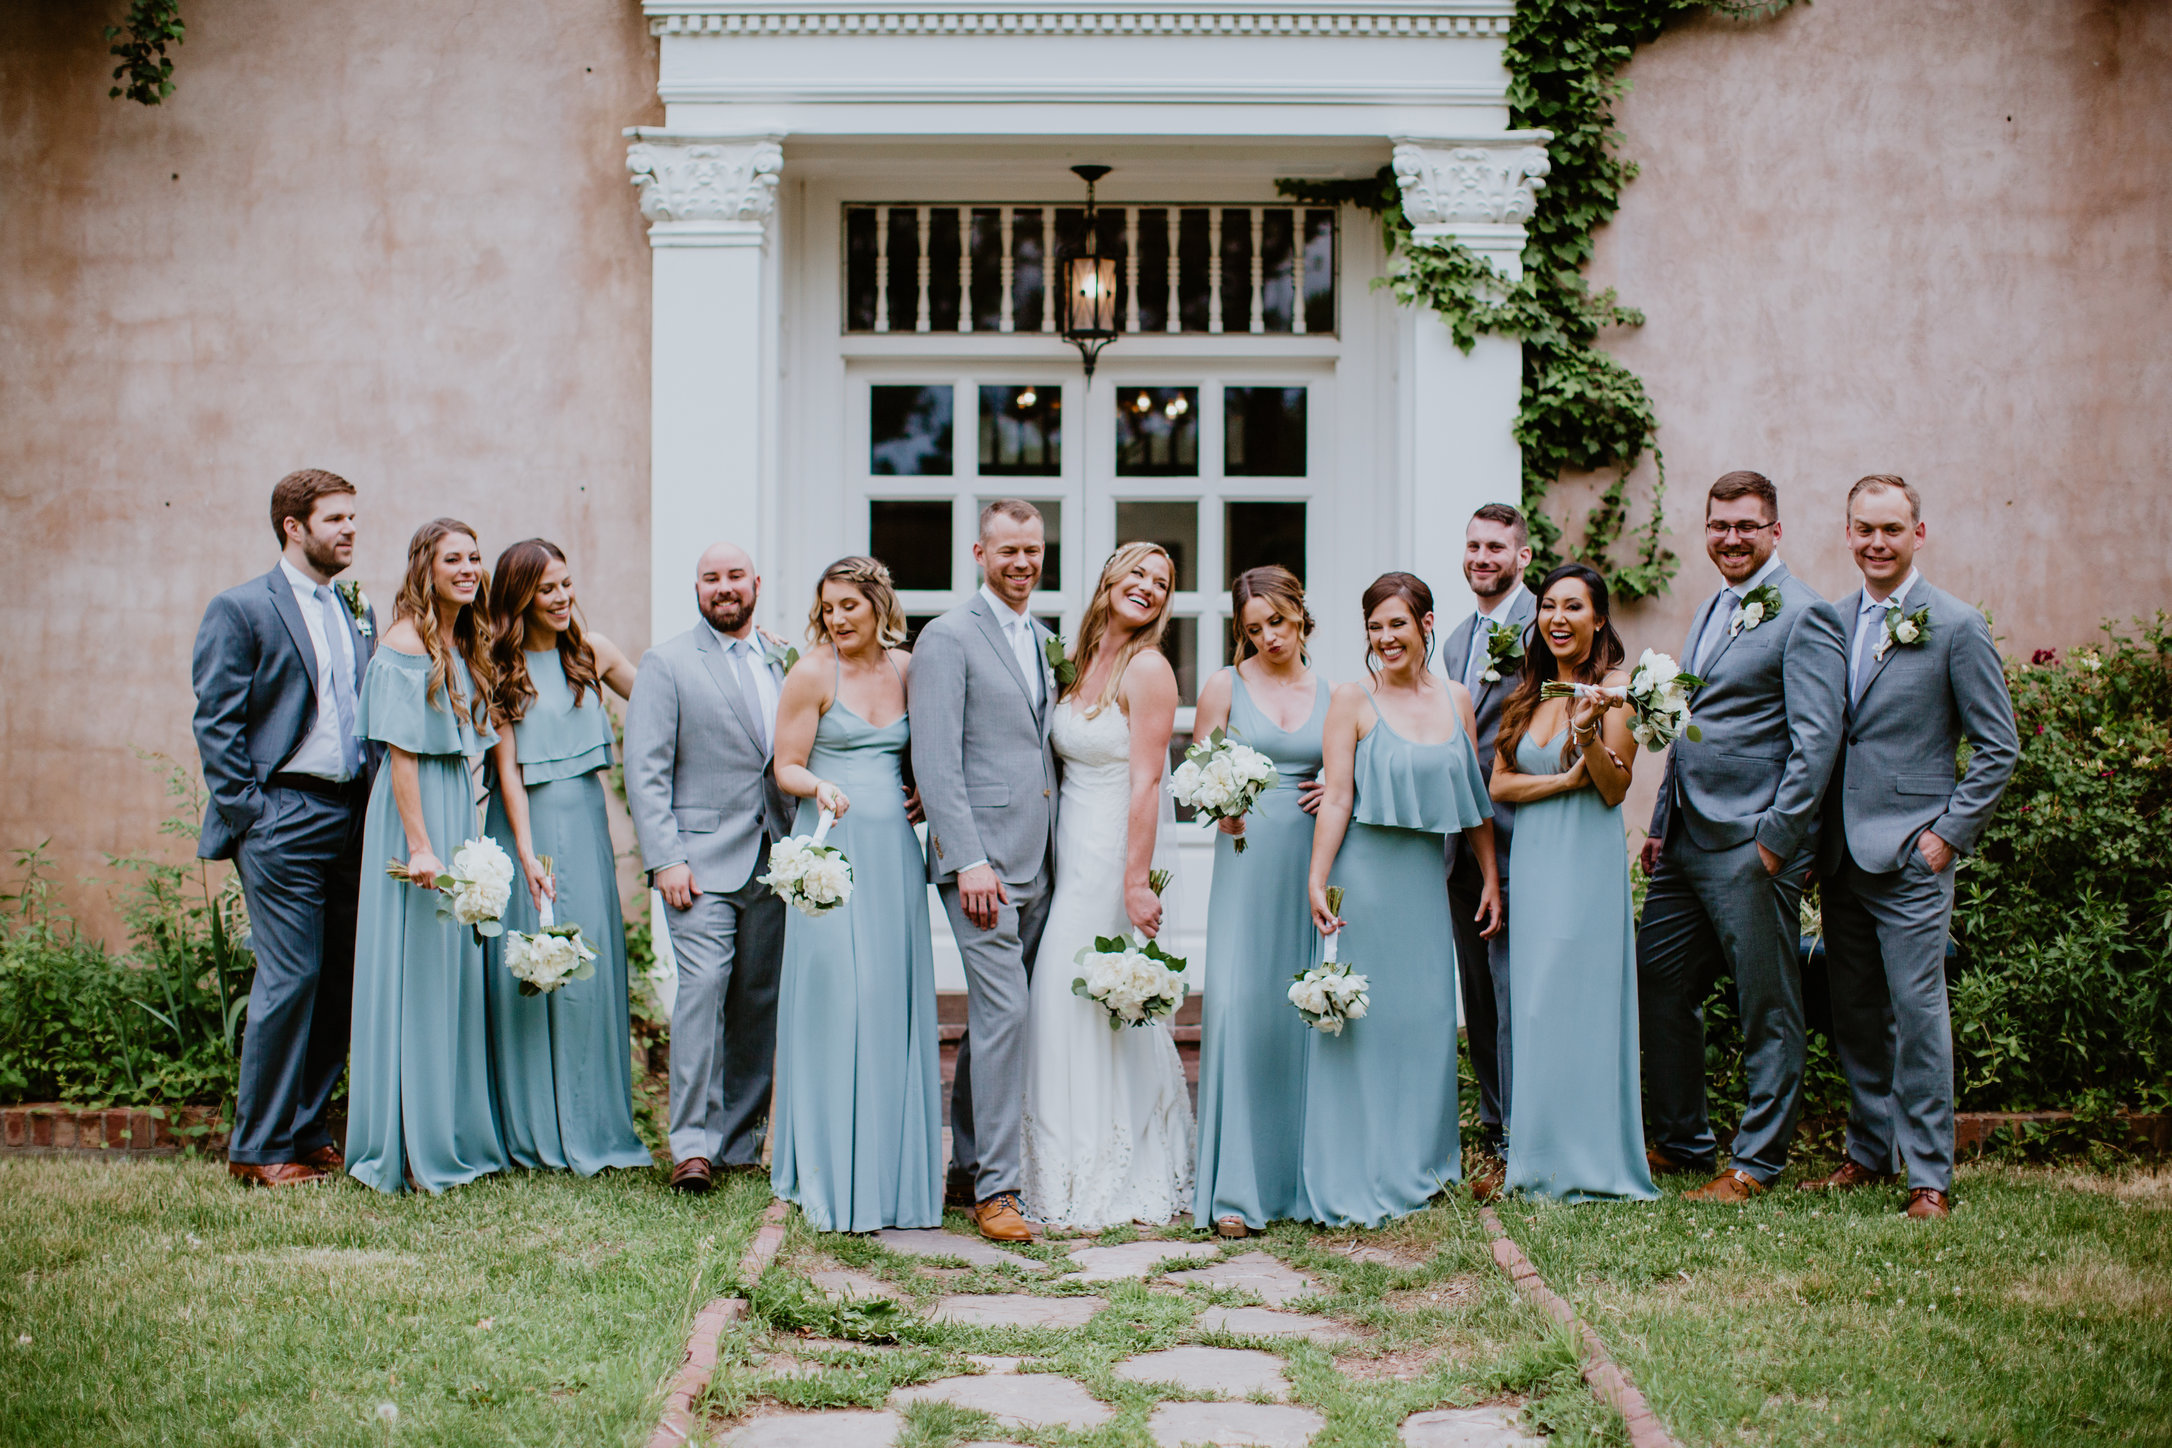 DandA-wedding-425.jpg